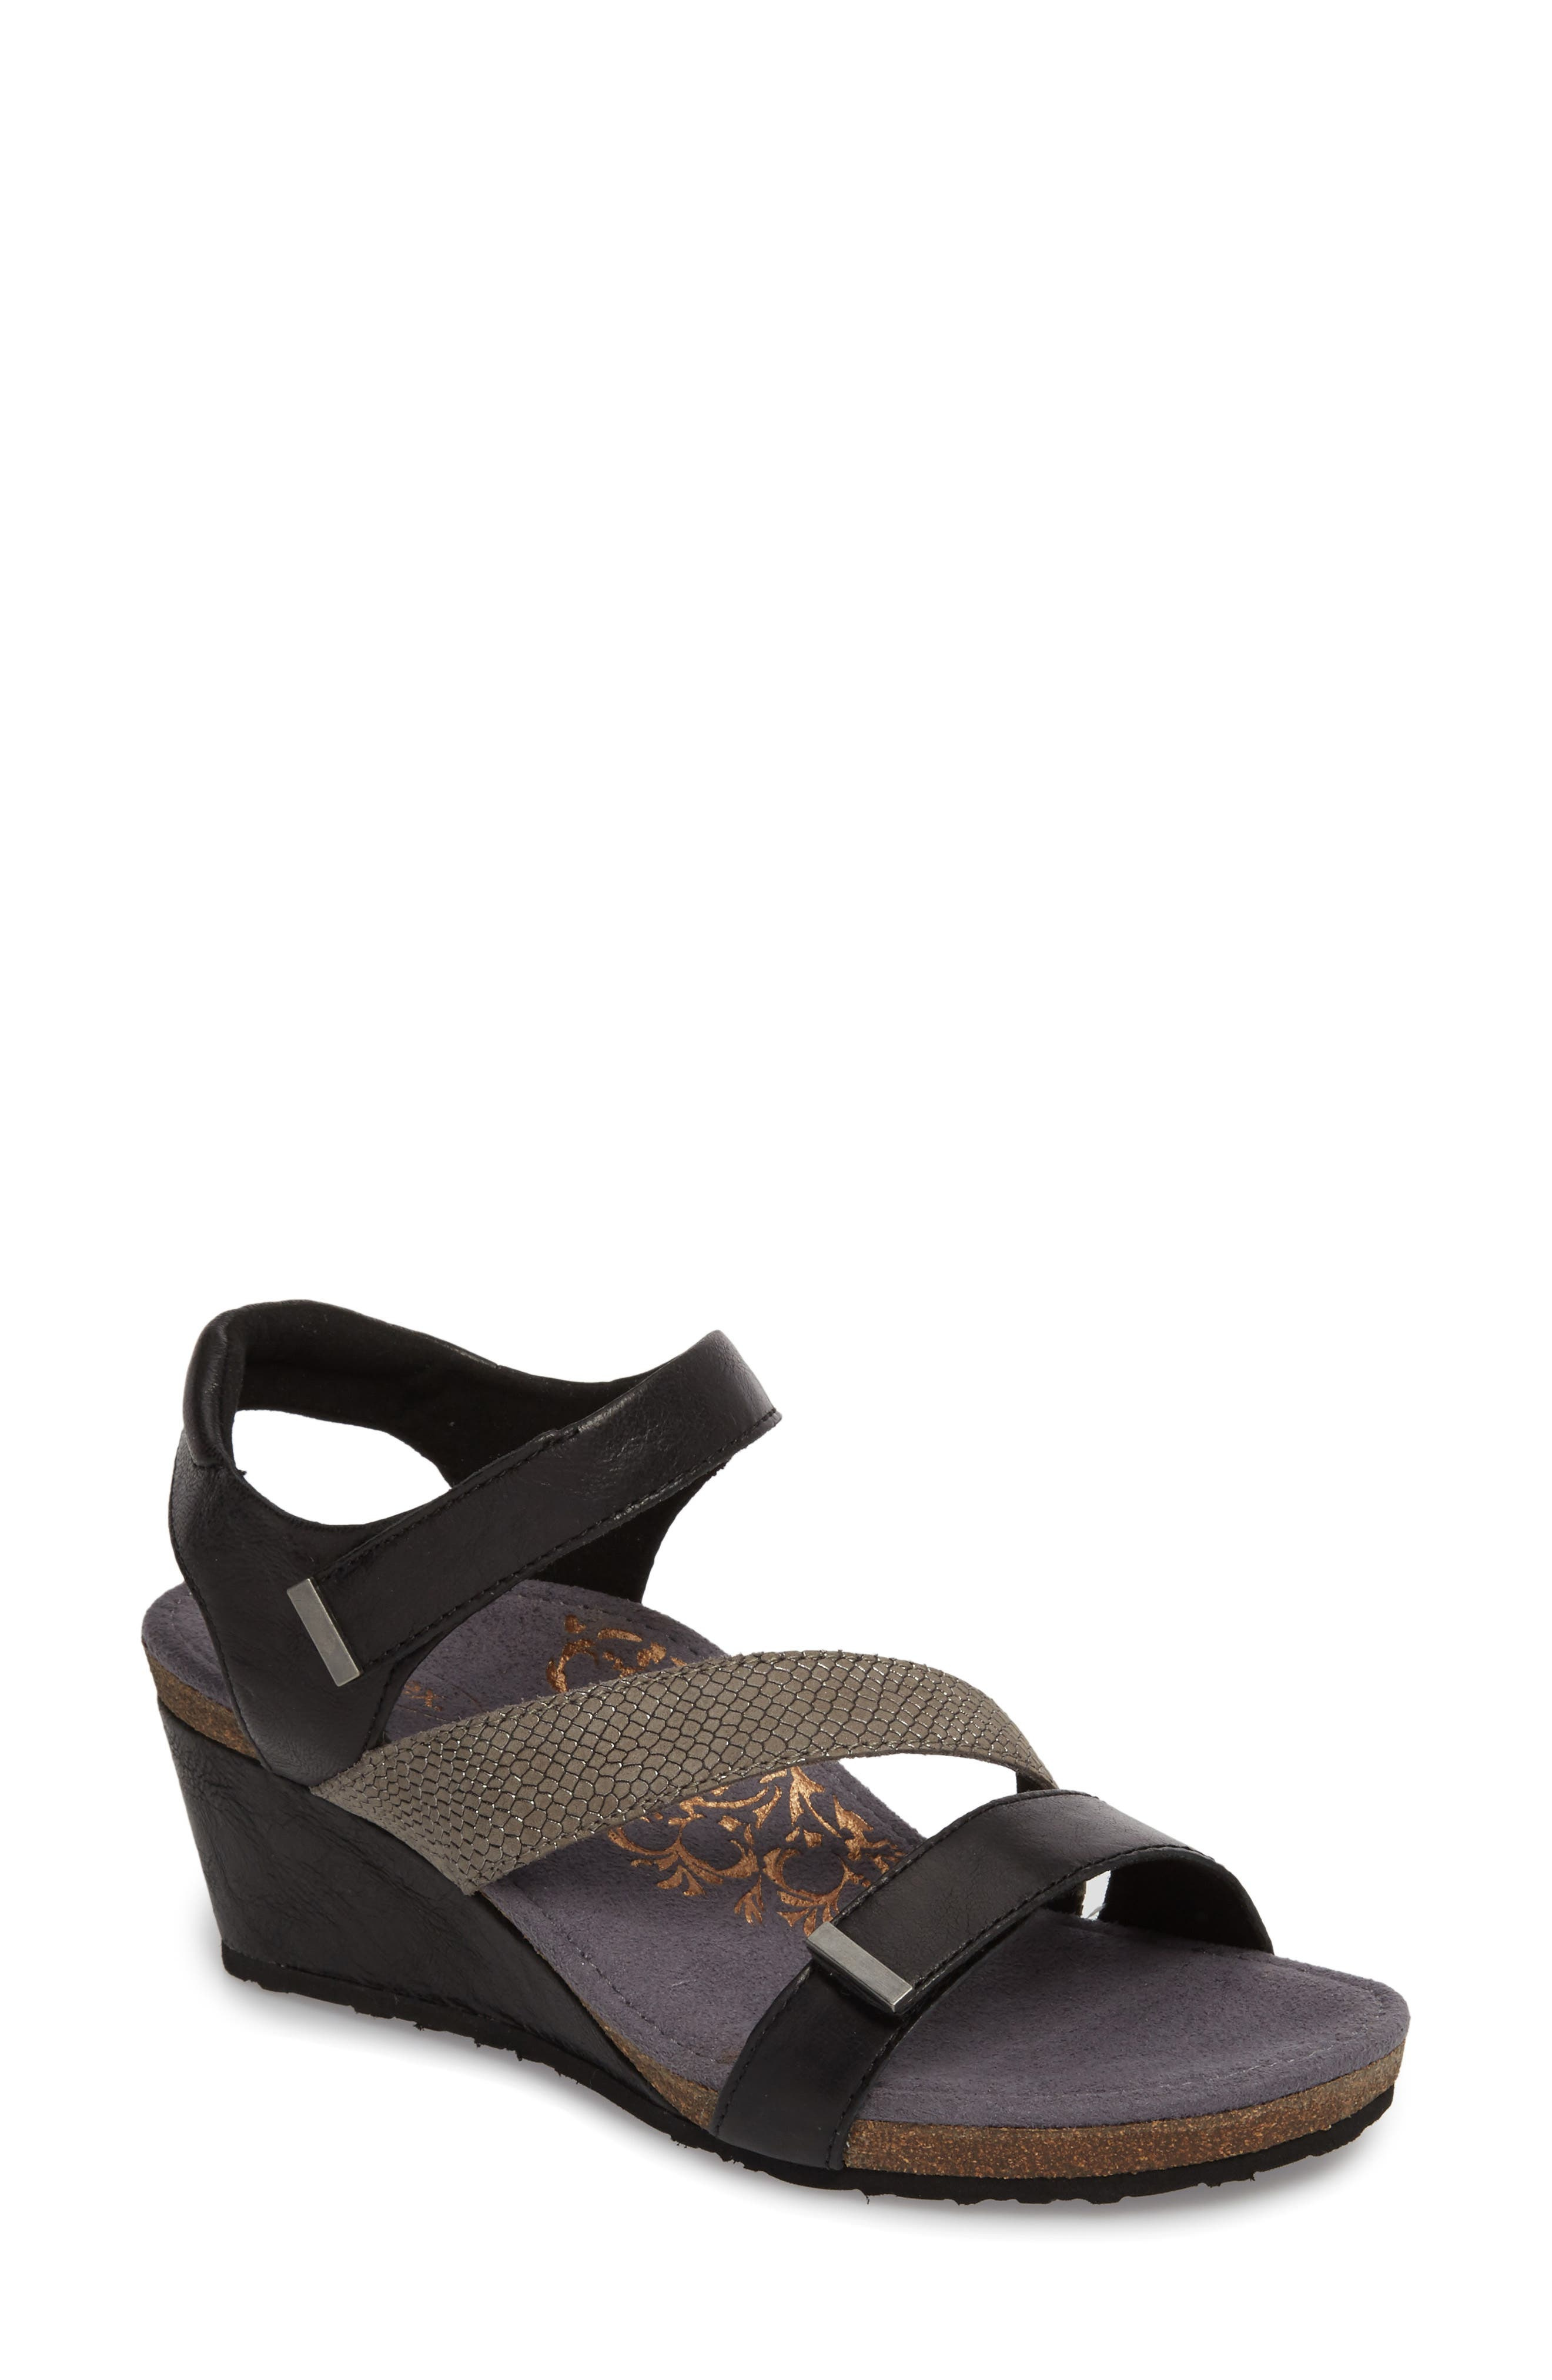 Brynn Asymmetrical Wedge Sandal,                             Main thumbnail 1, color,                             Black Leather